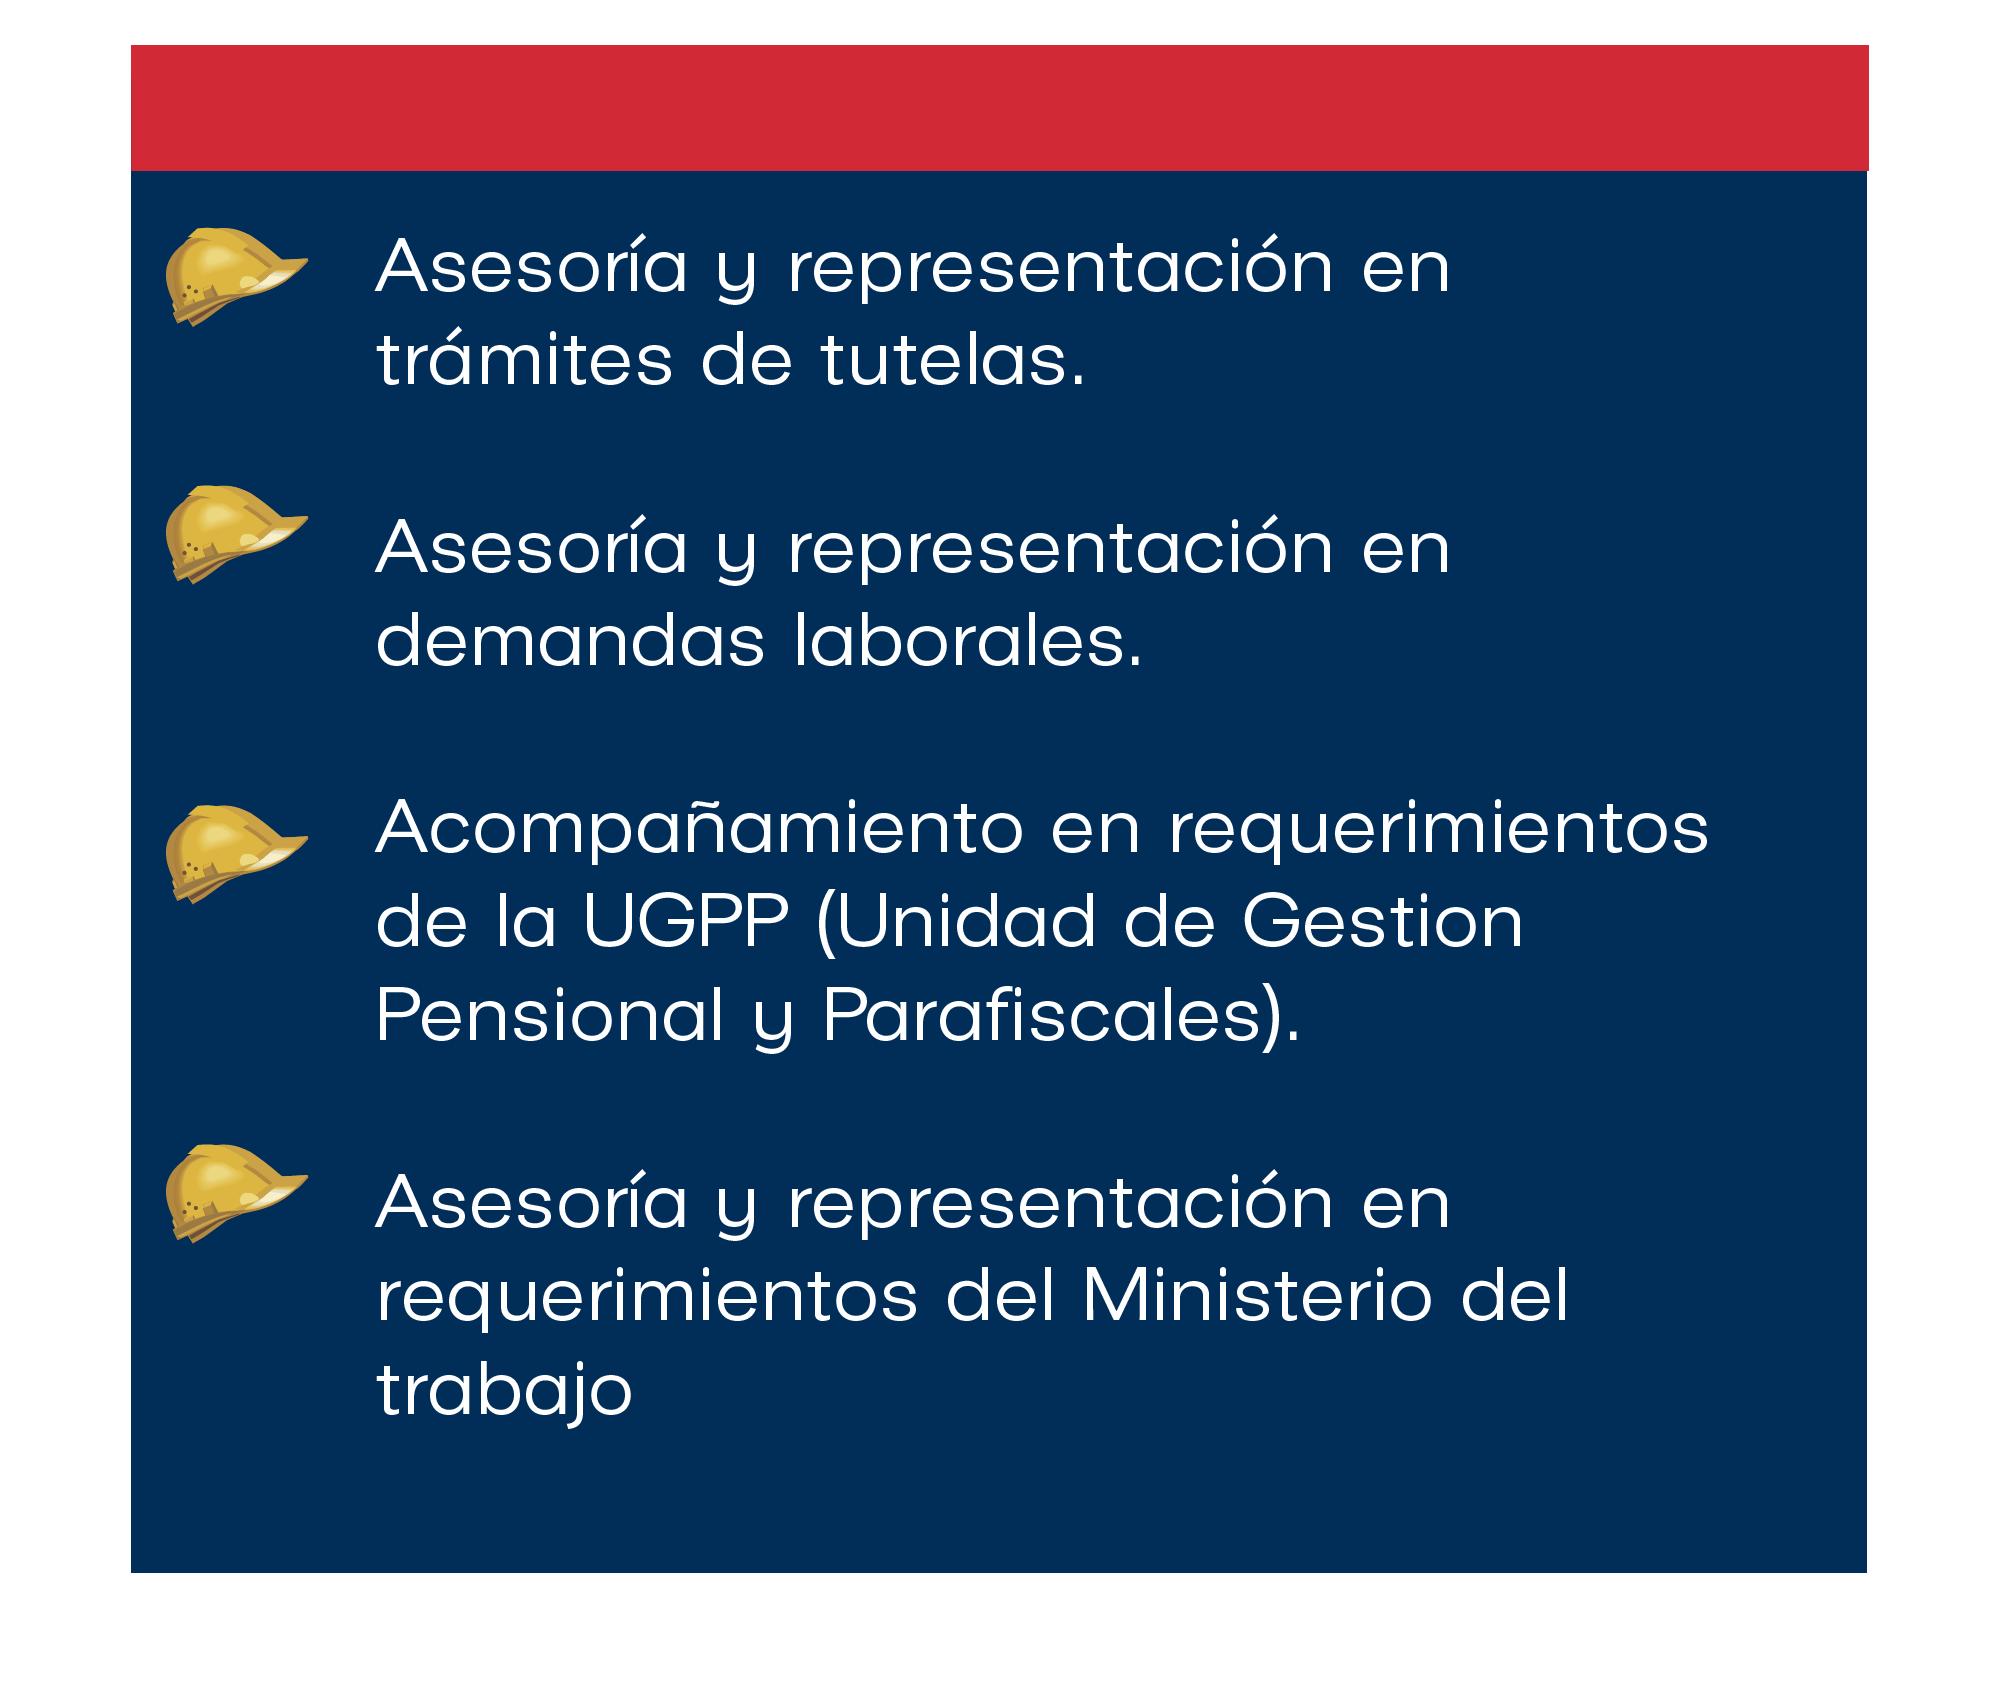 1_asesoríaengestionambiental-01-03